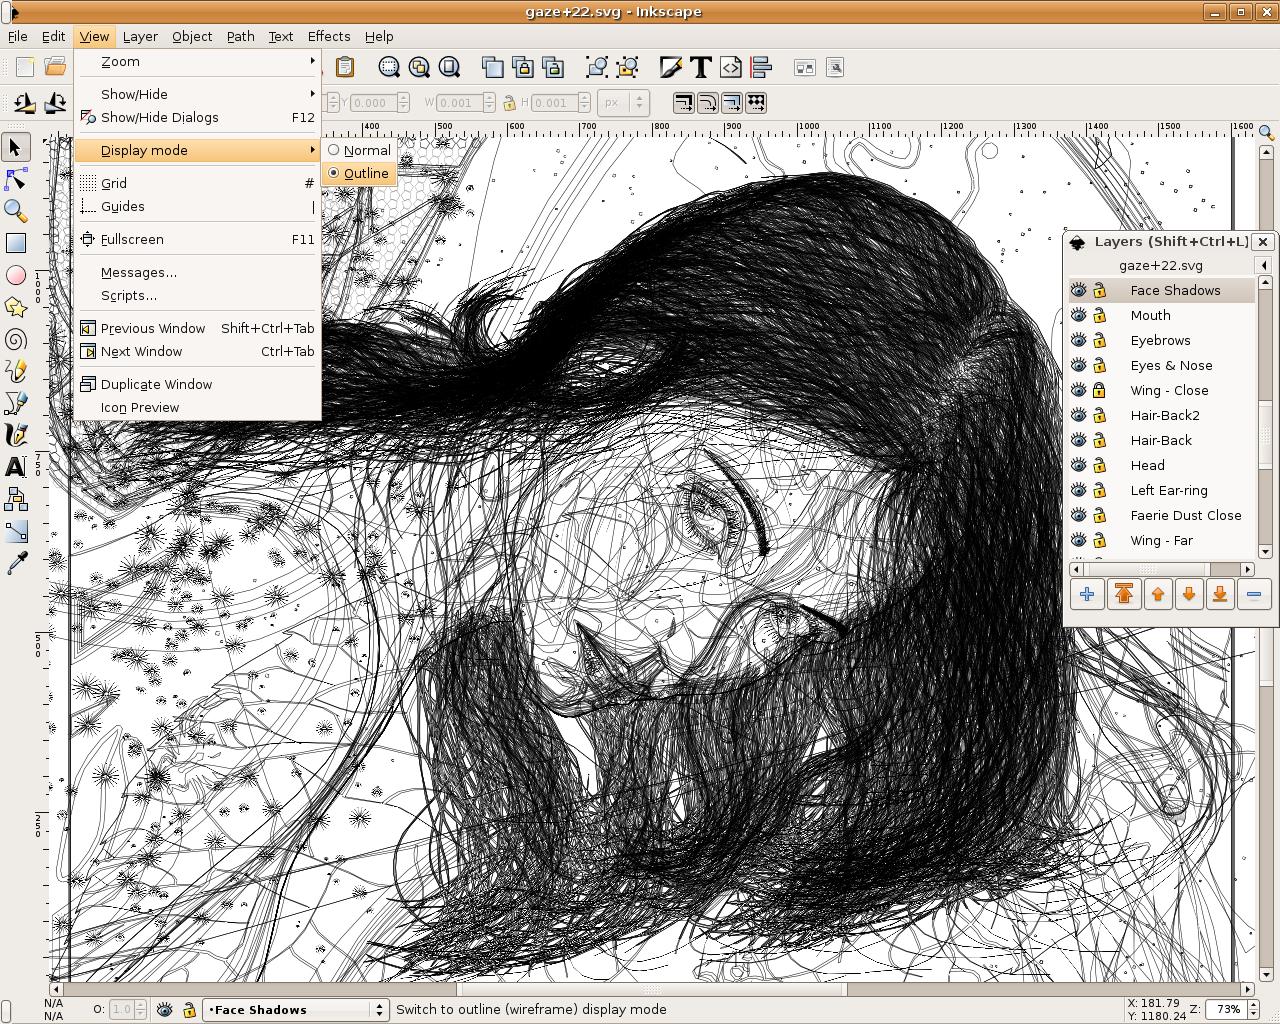 1280x1024 Inkscape